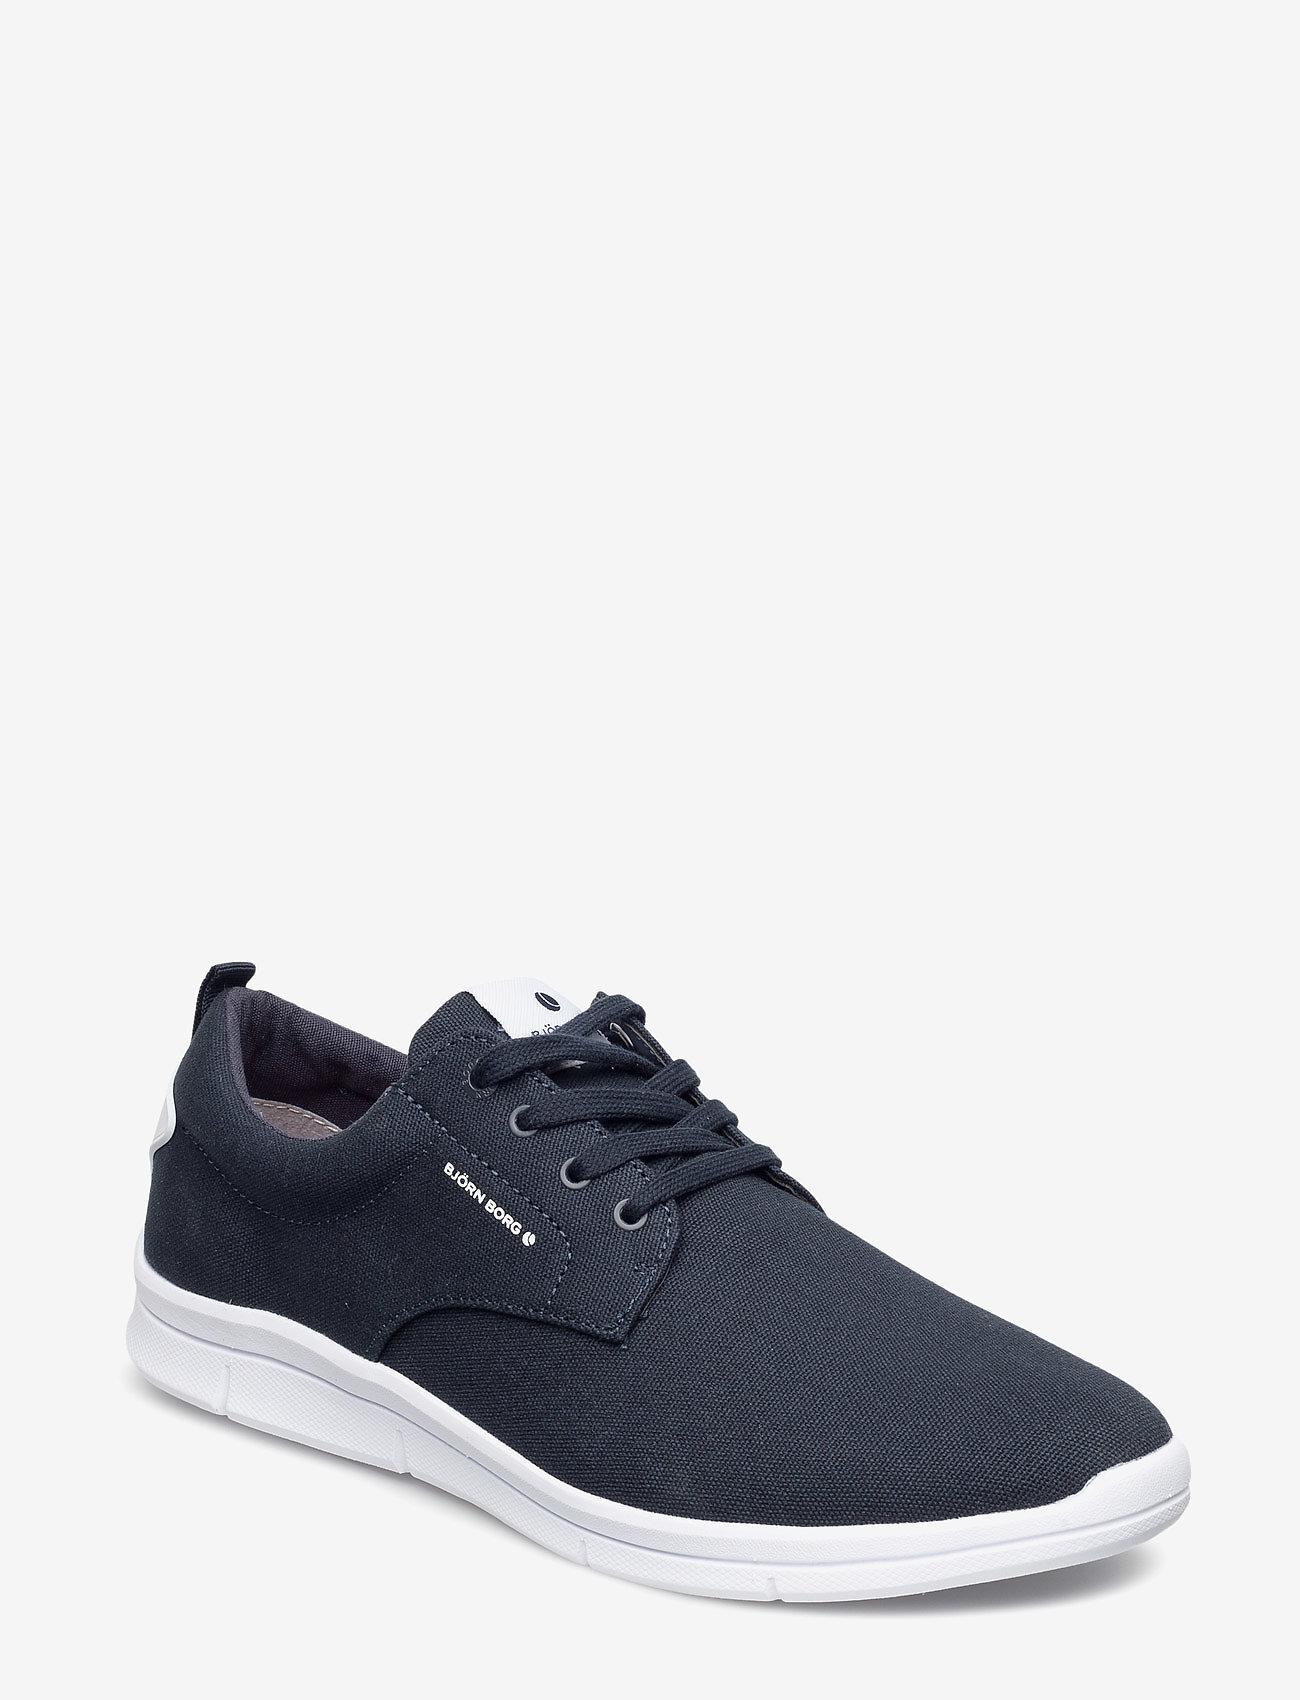 Björn Borg - X200 Low Cvs M - laag sneakers - navy - 0